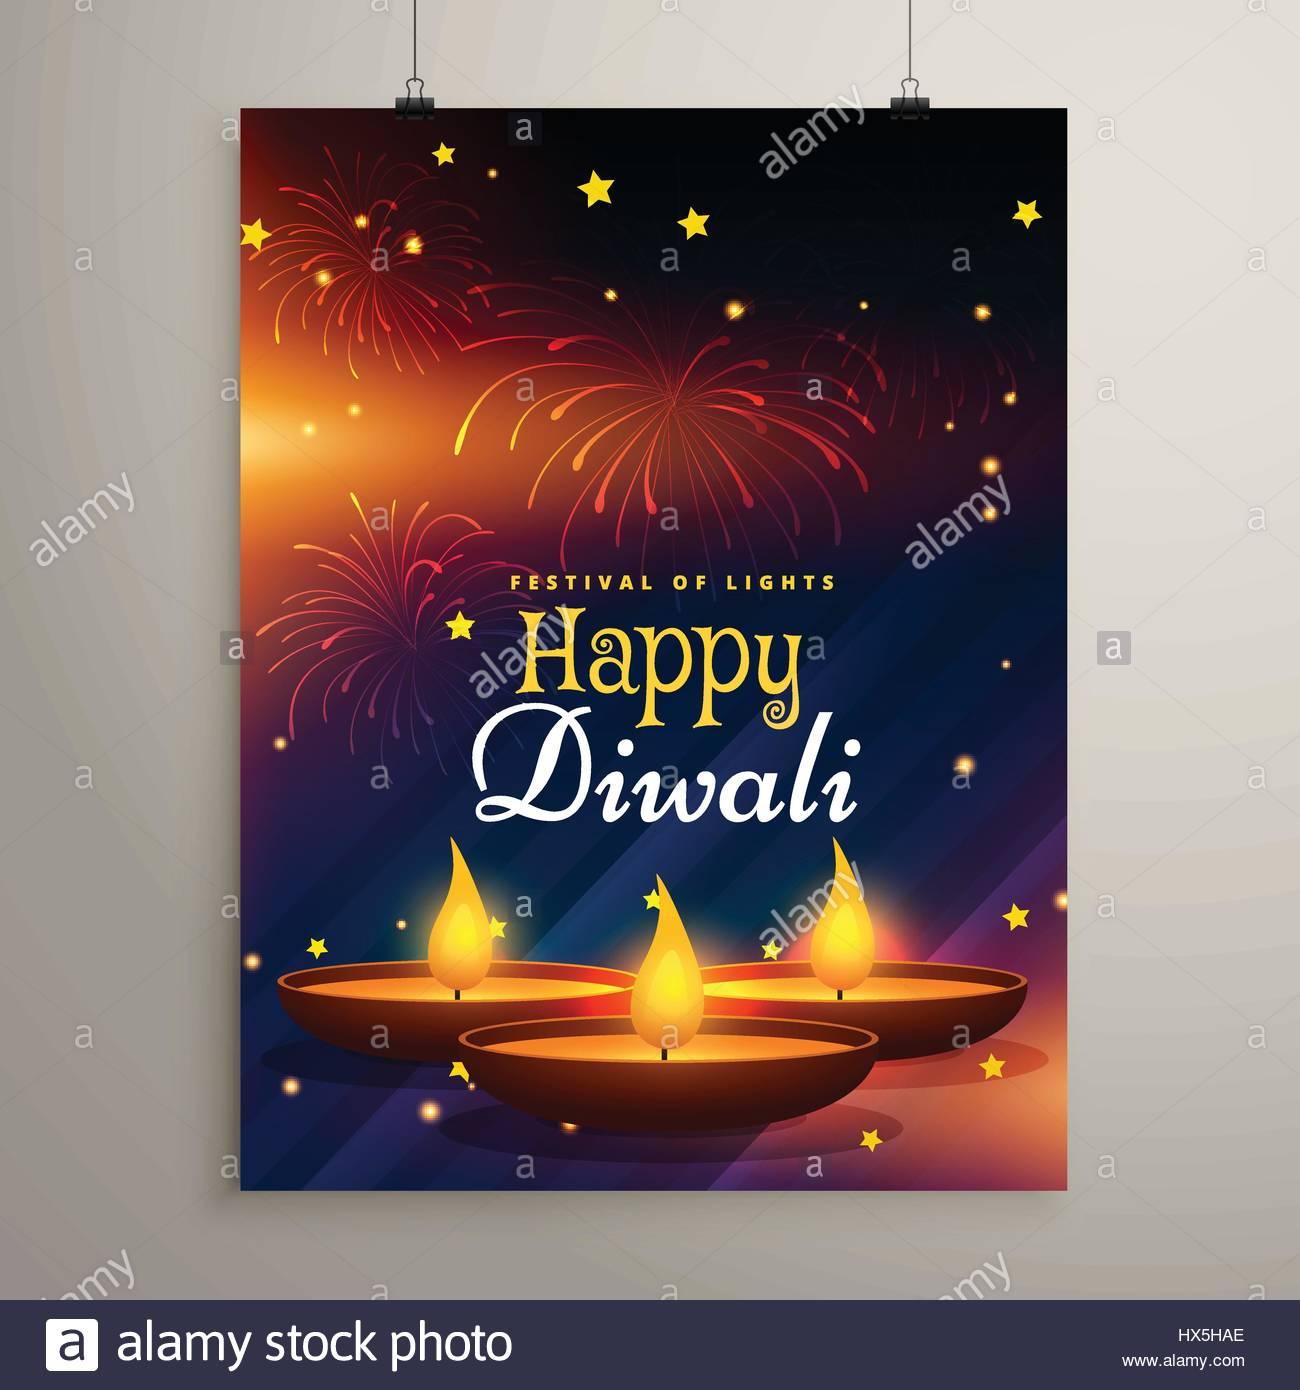 Flyer Design For Diwali Festival Diwali Greeting Card Stock Vector